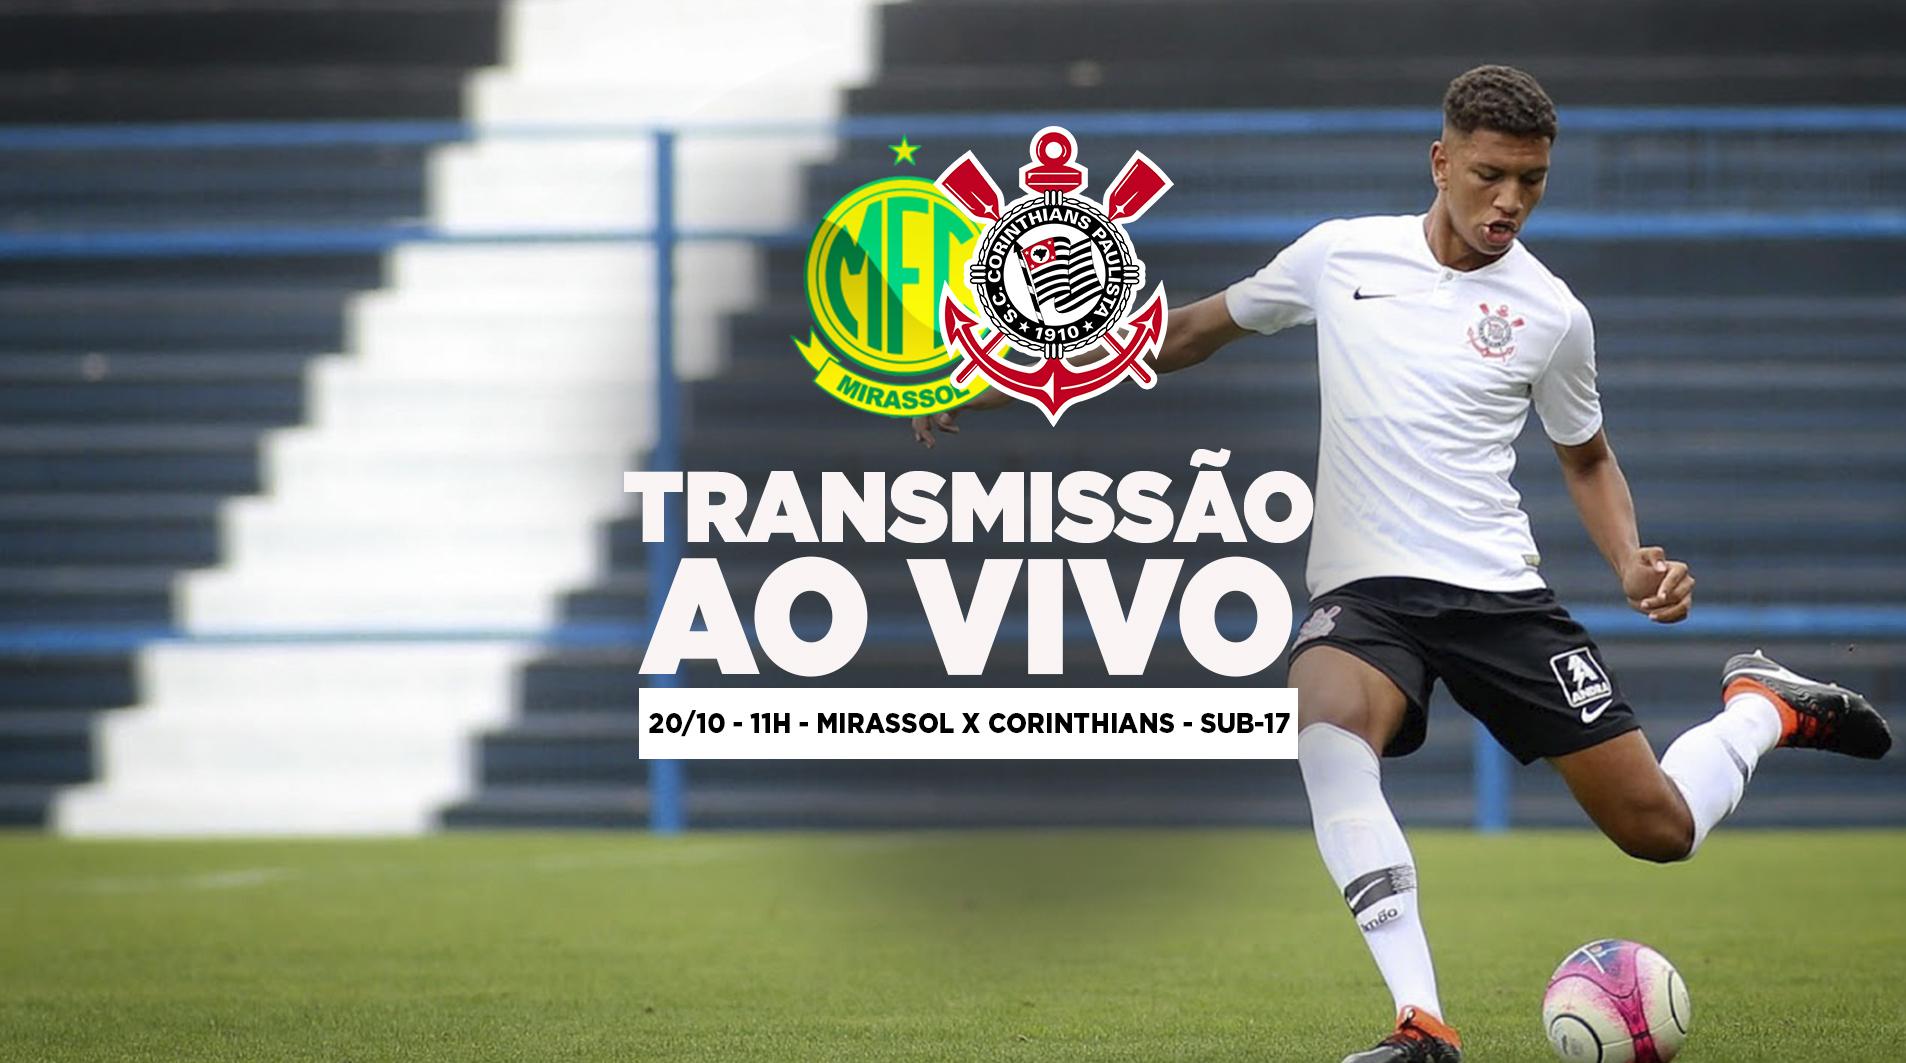 Mirassol x Corinthians - Paulistão Sub-17